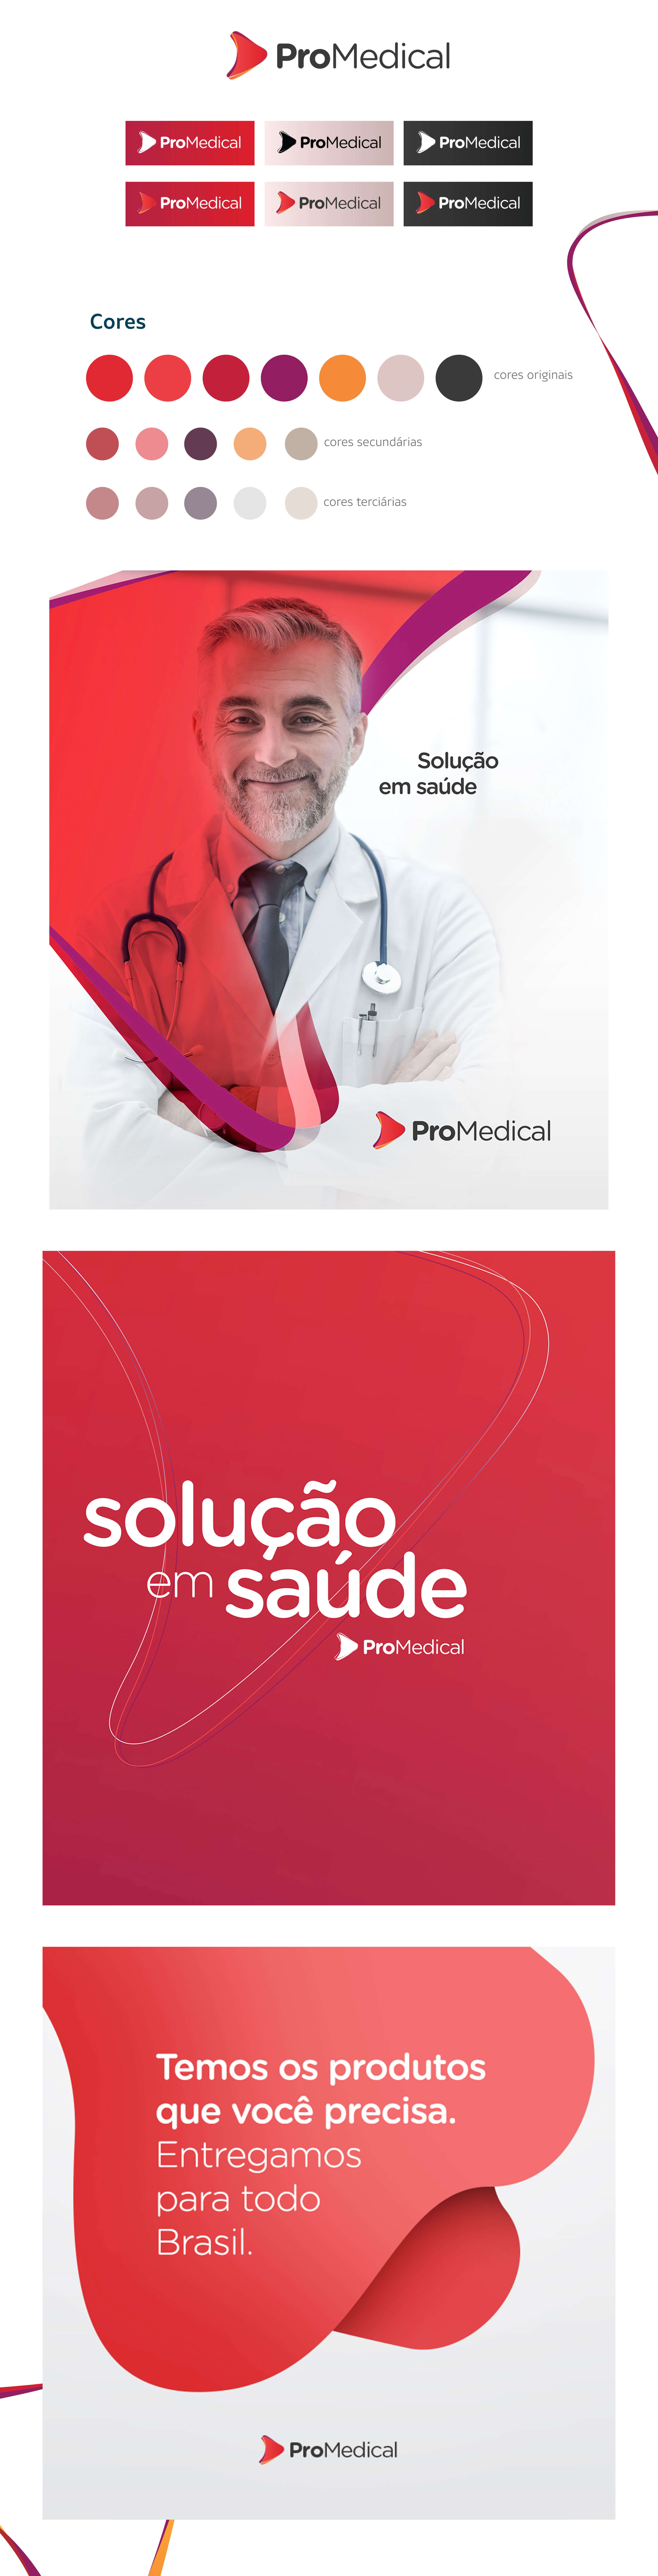 branding-promedical-2